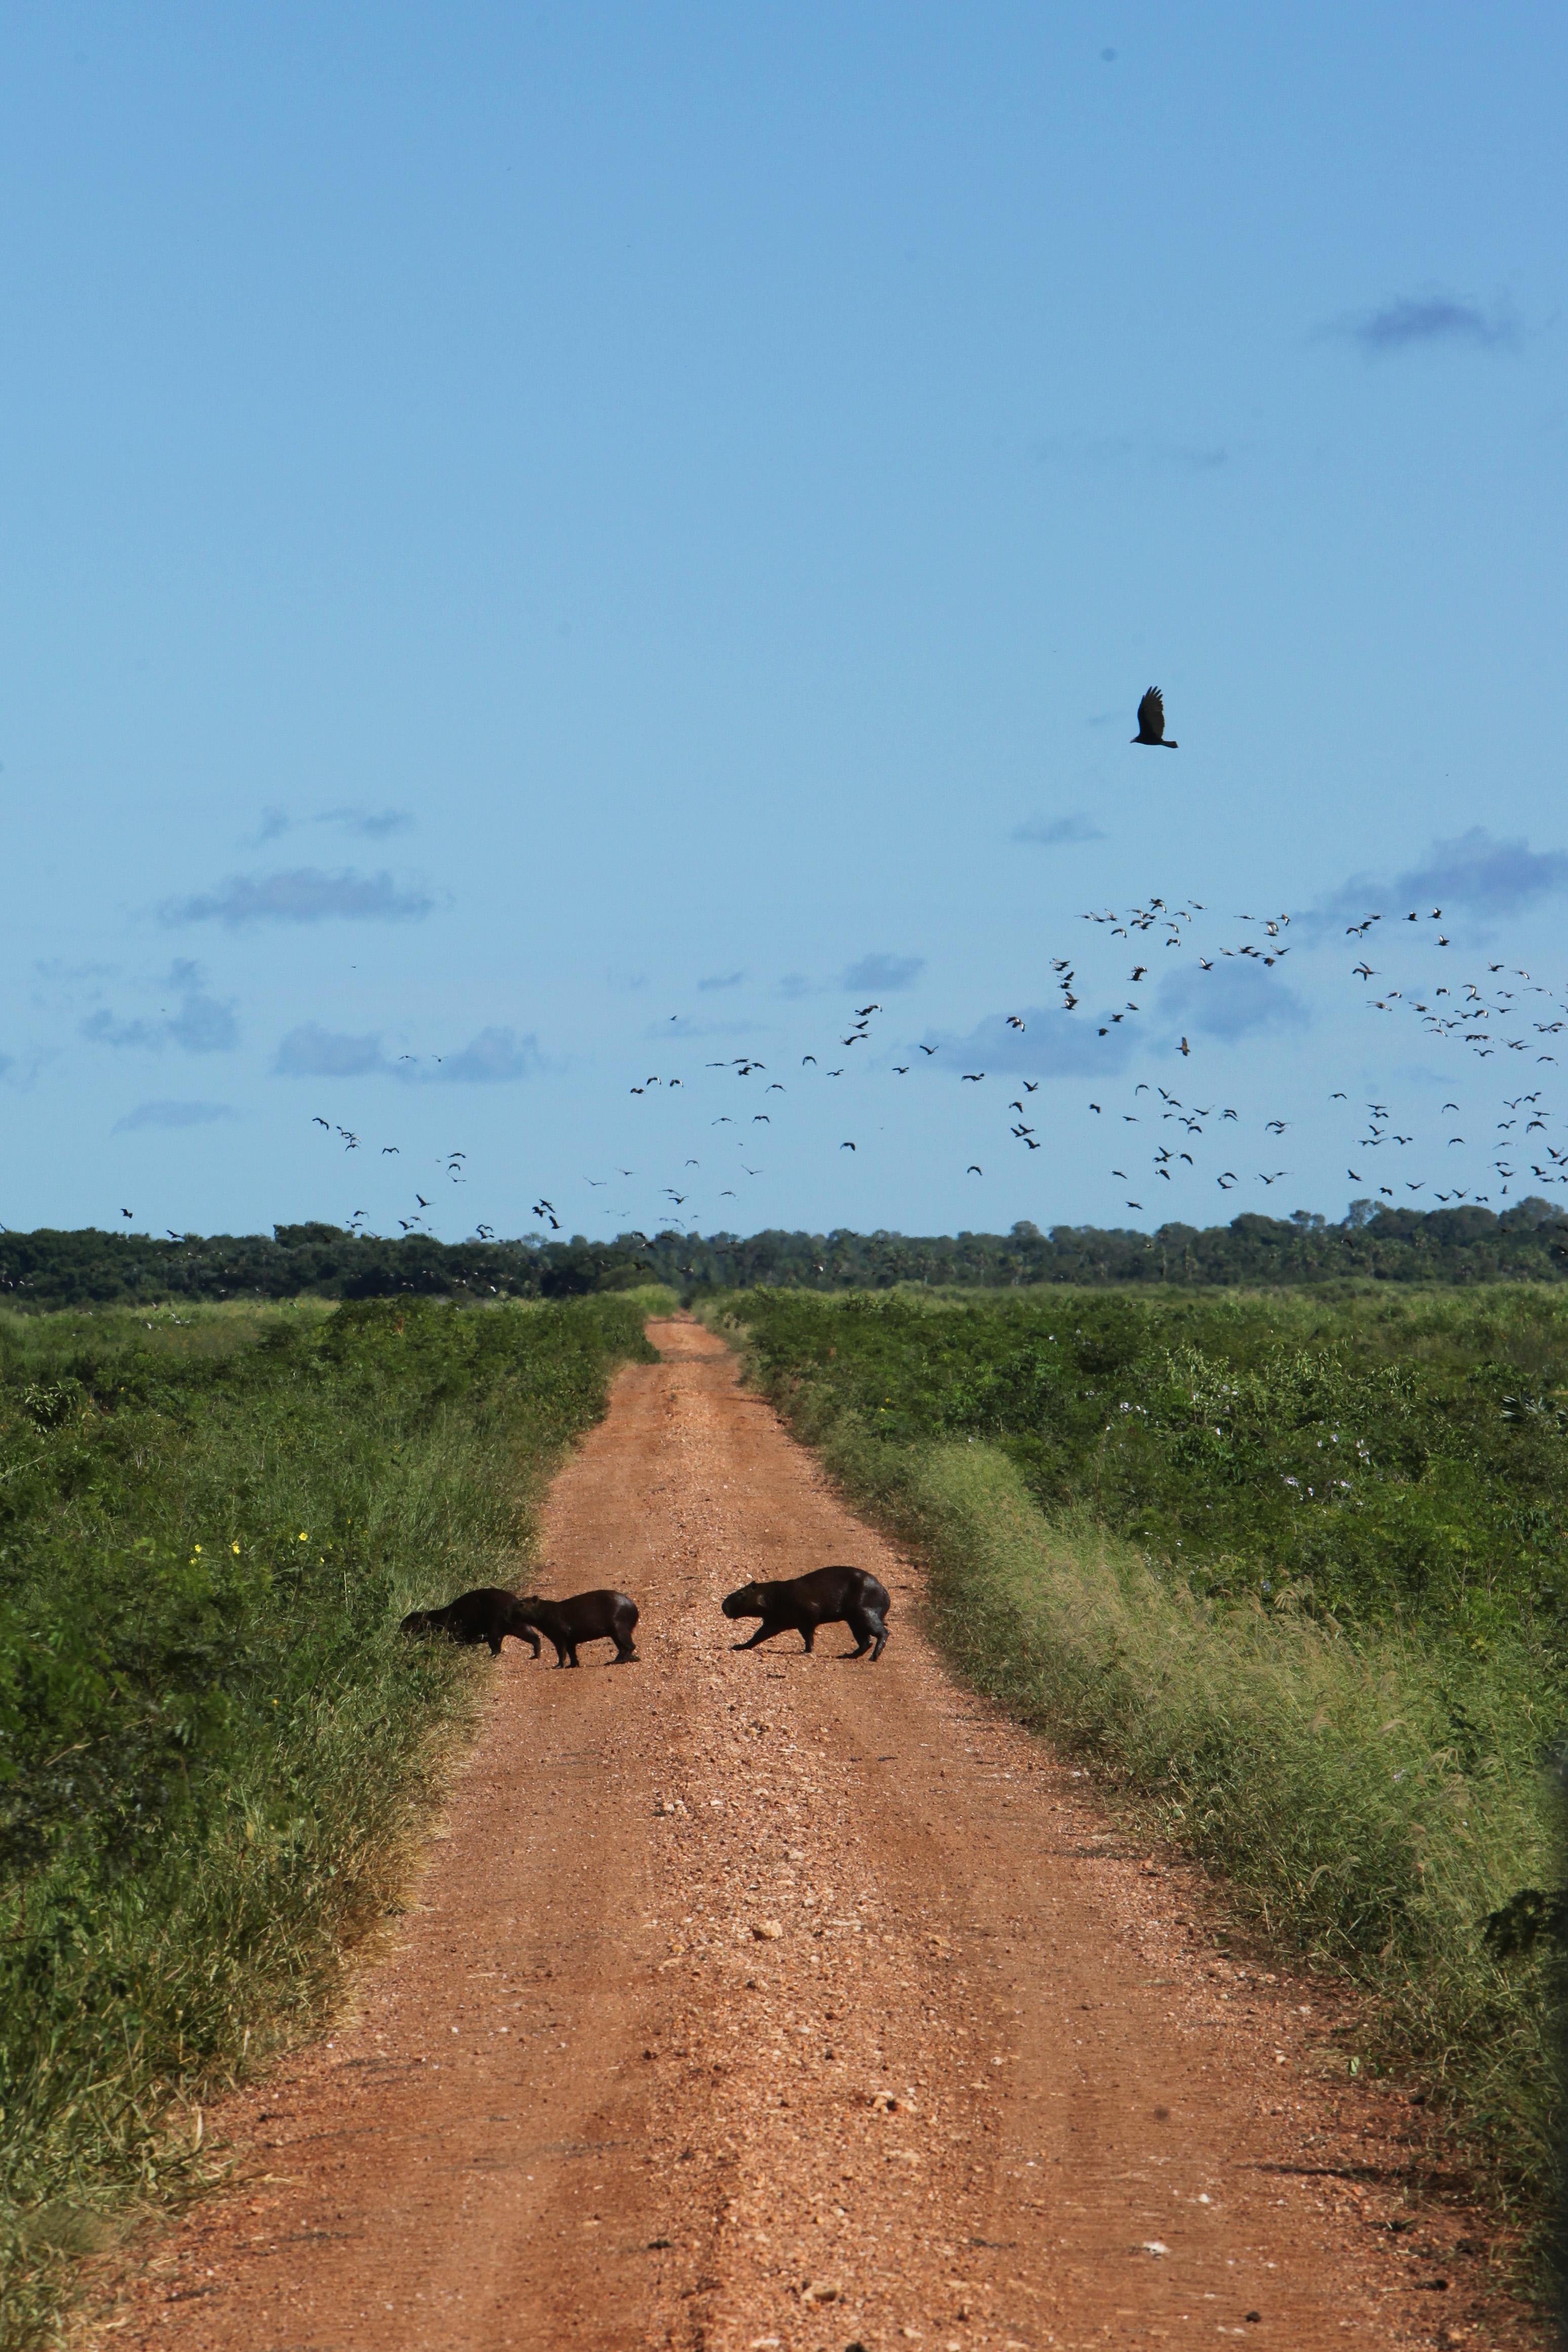 Travessia de Capivaras - Pantanal MS